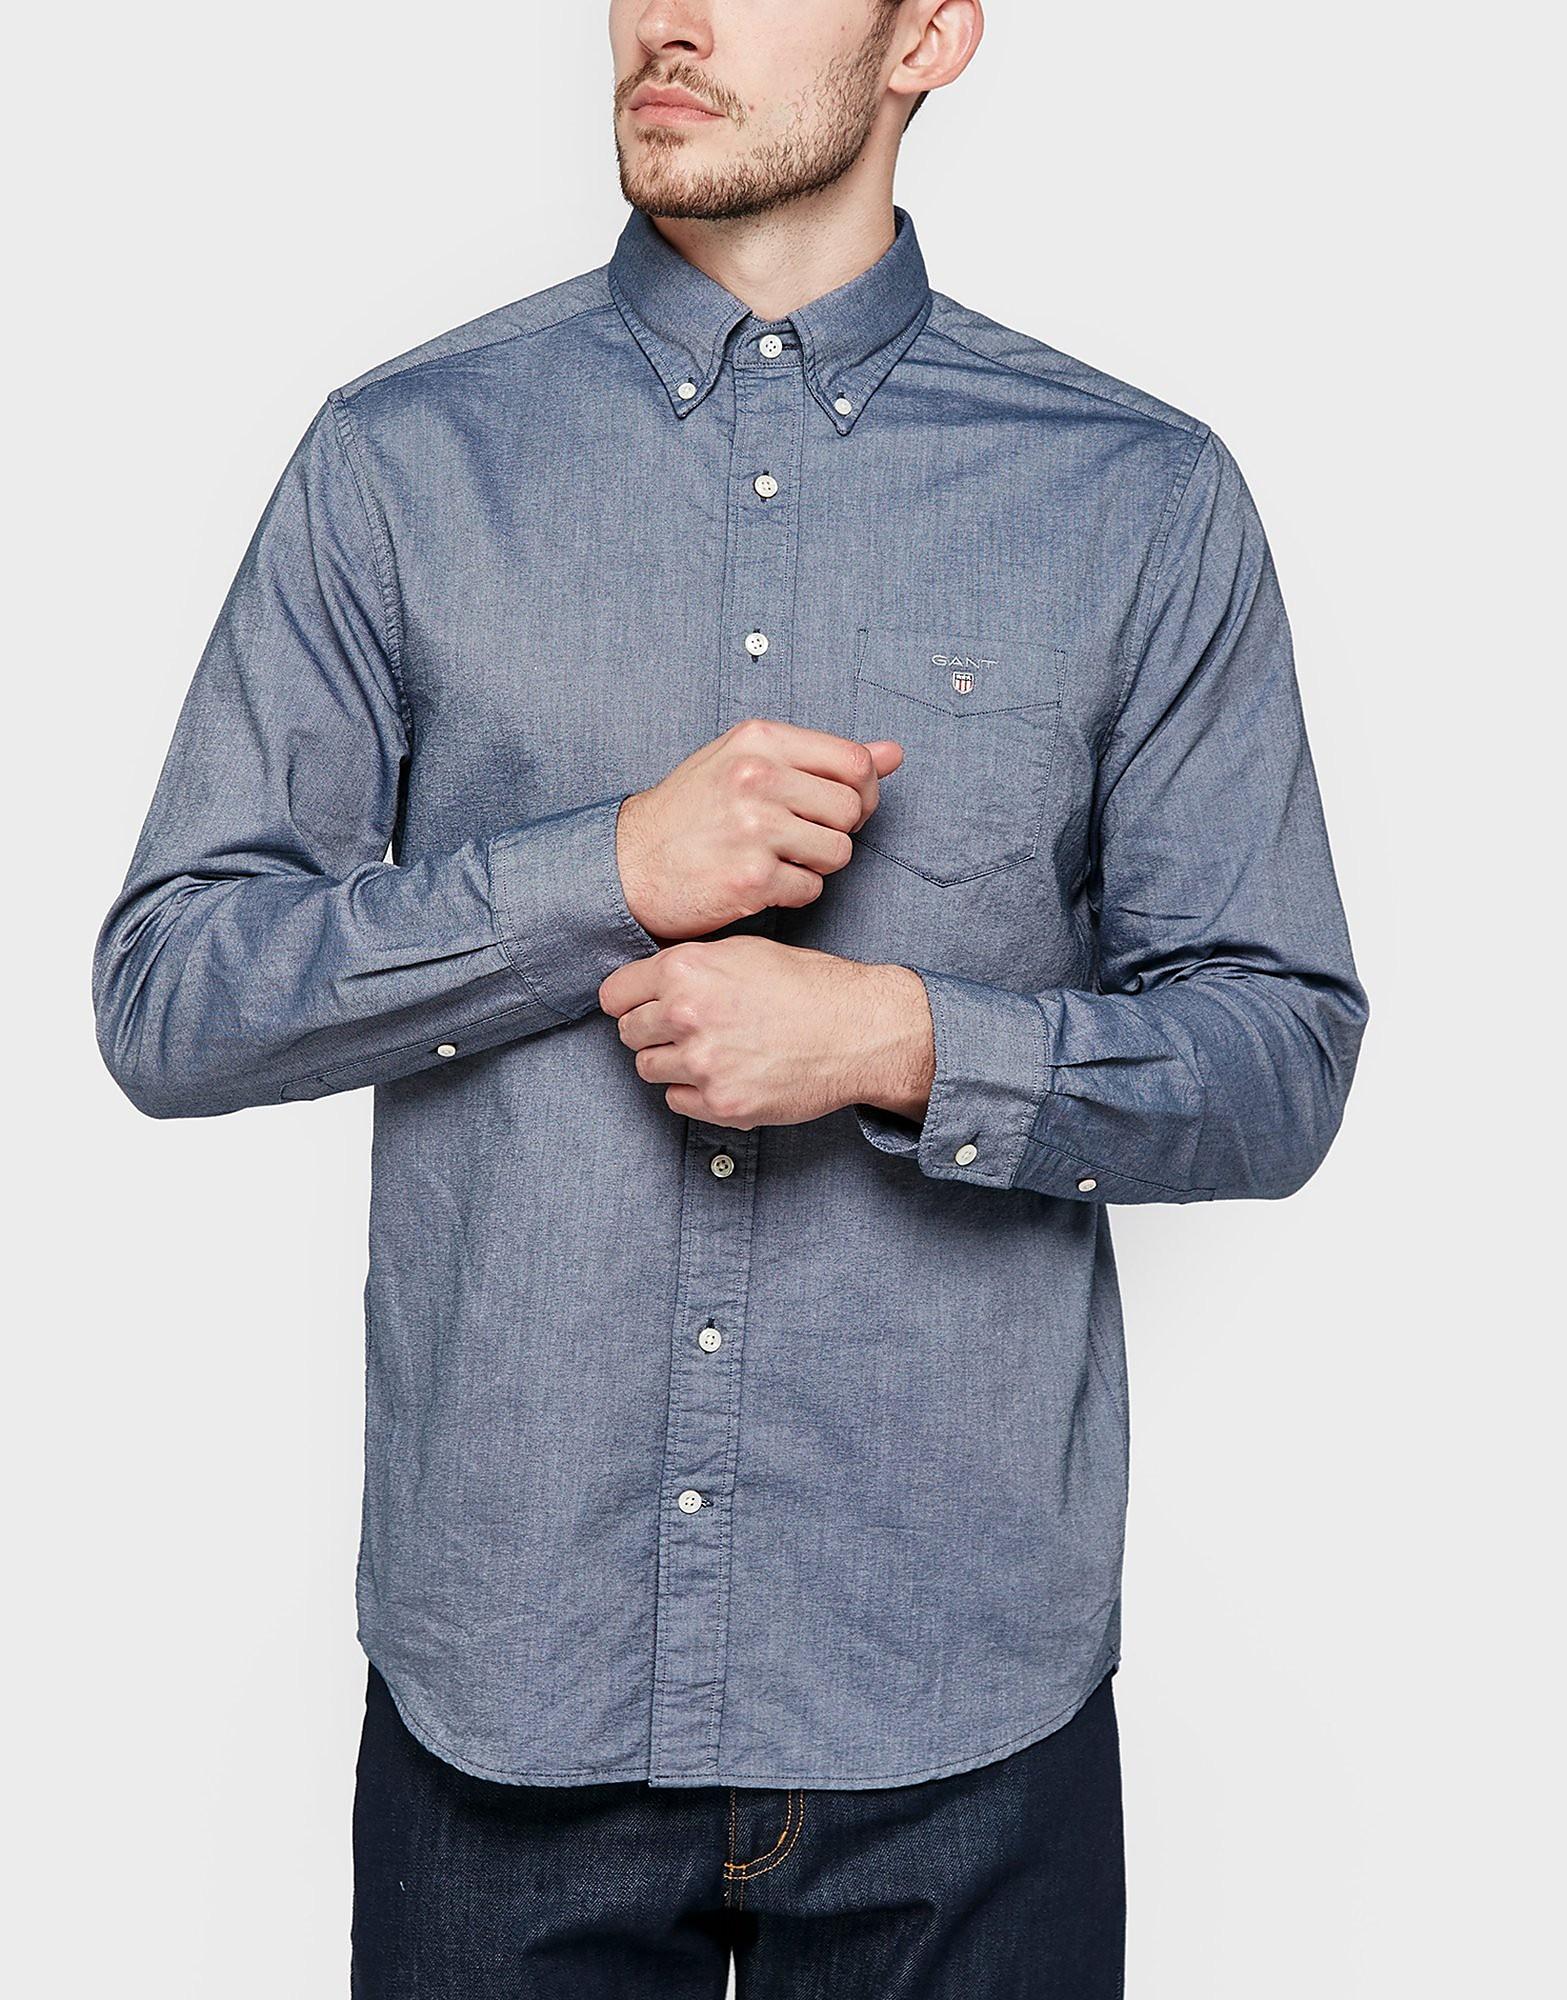 GANT Oxford Long Sleeve Shirt